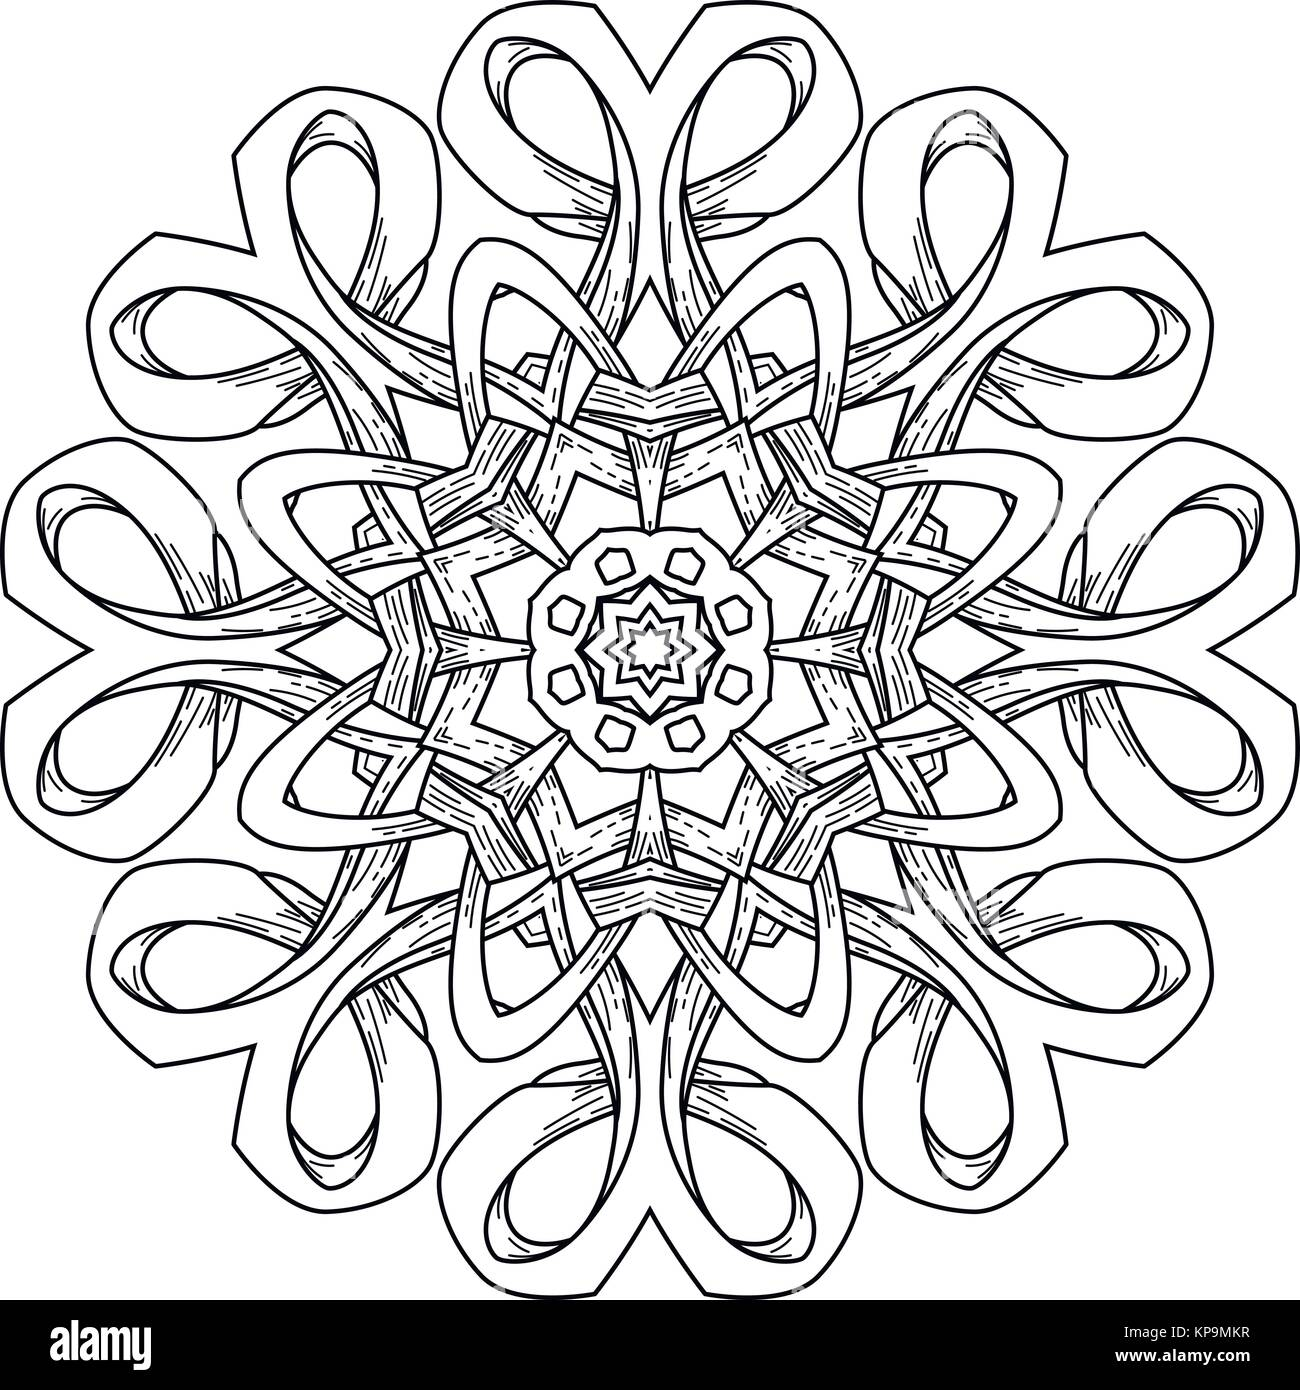 Mandala. Resumen fondo decorativo. El Islam, árabe, oriental, India ...